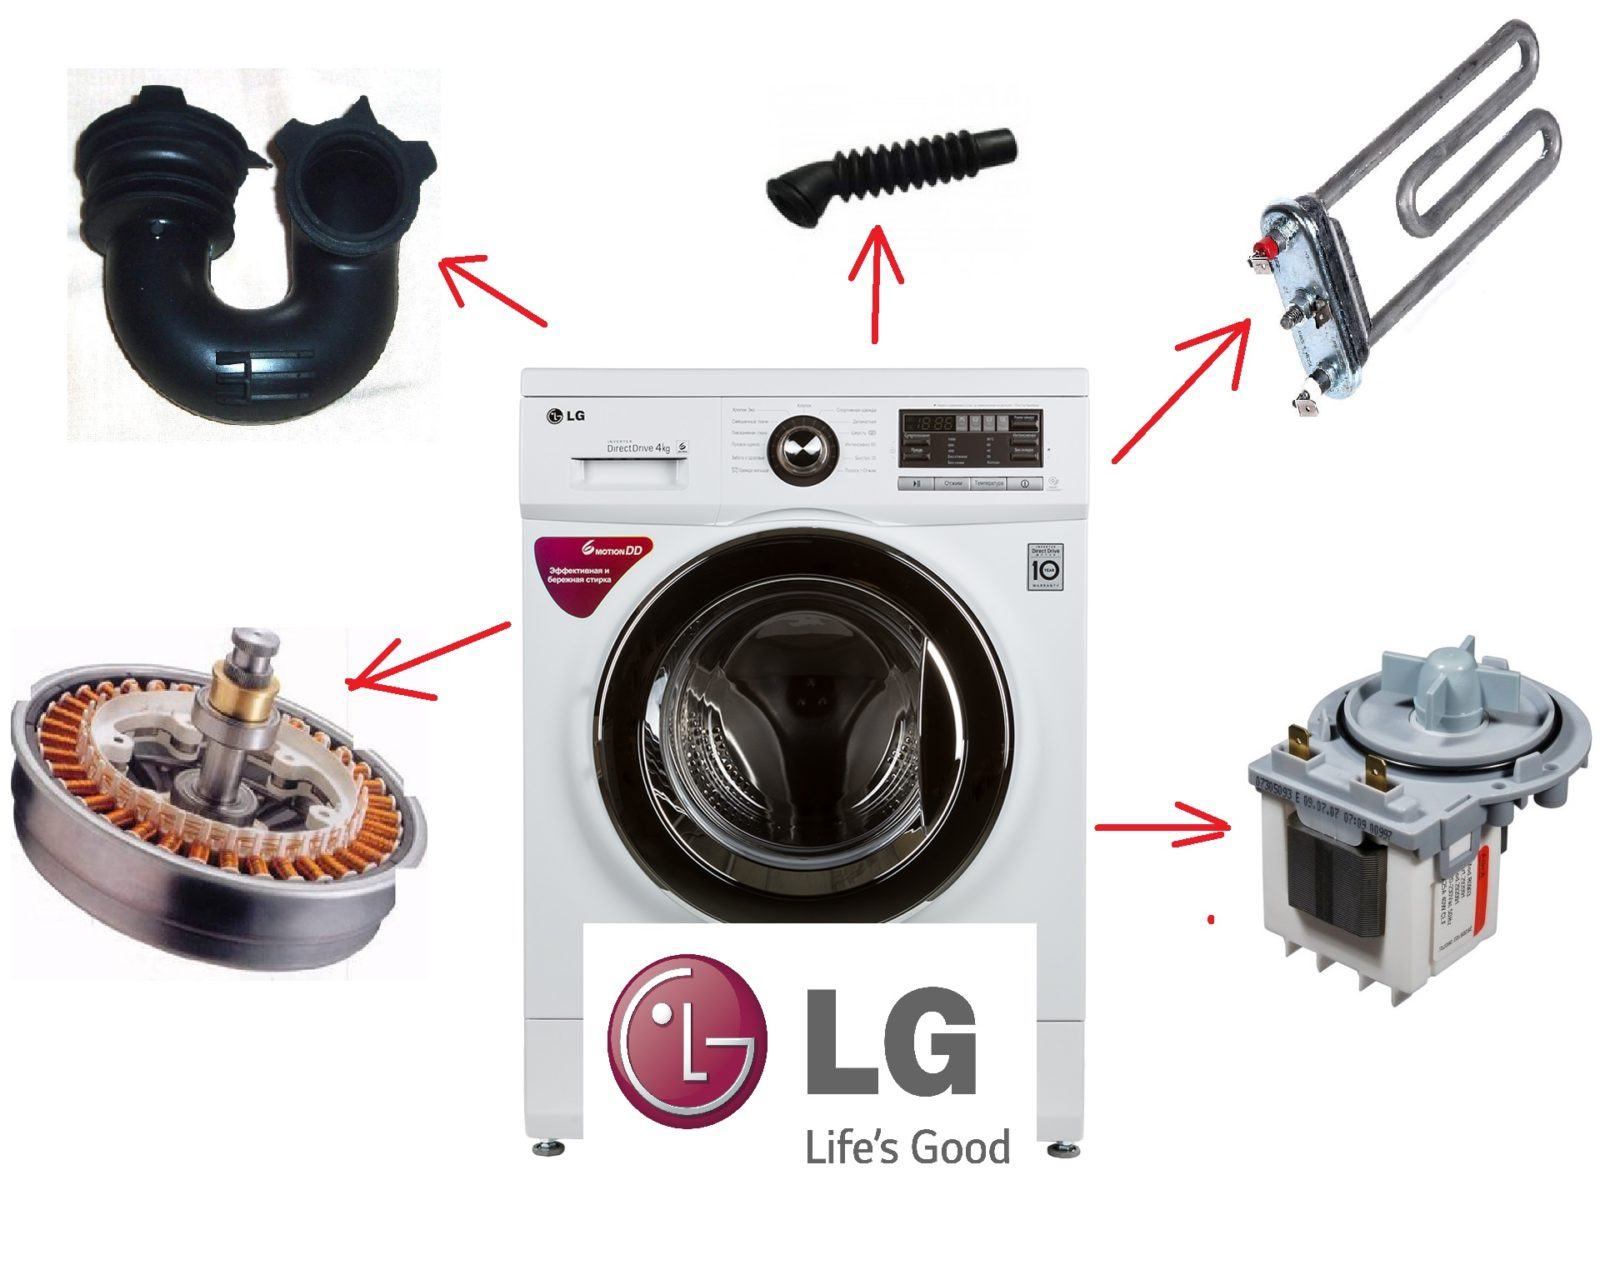 Pembongkaran DIY mesin basuh LG